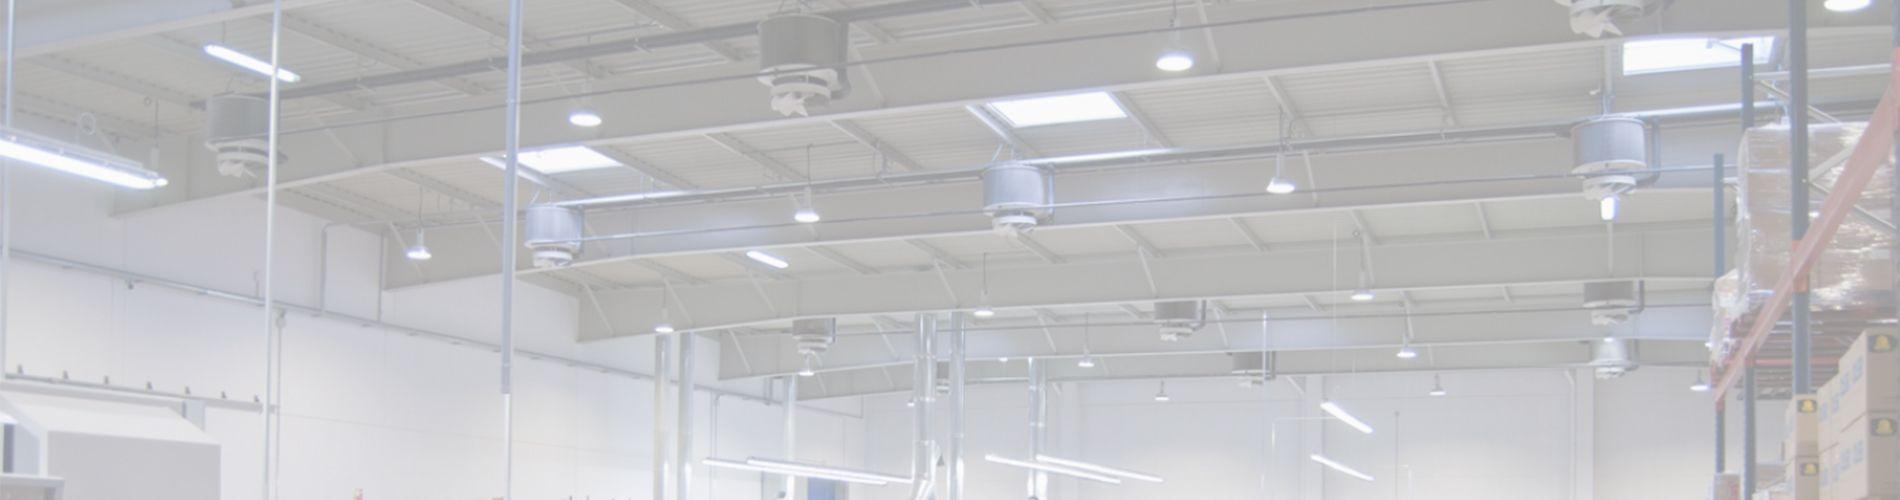 slide_indus Eclairage industriel LED - Eclairage LED Universal